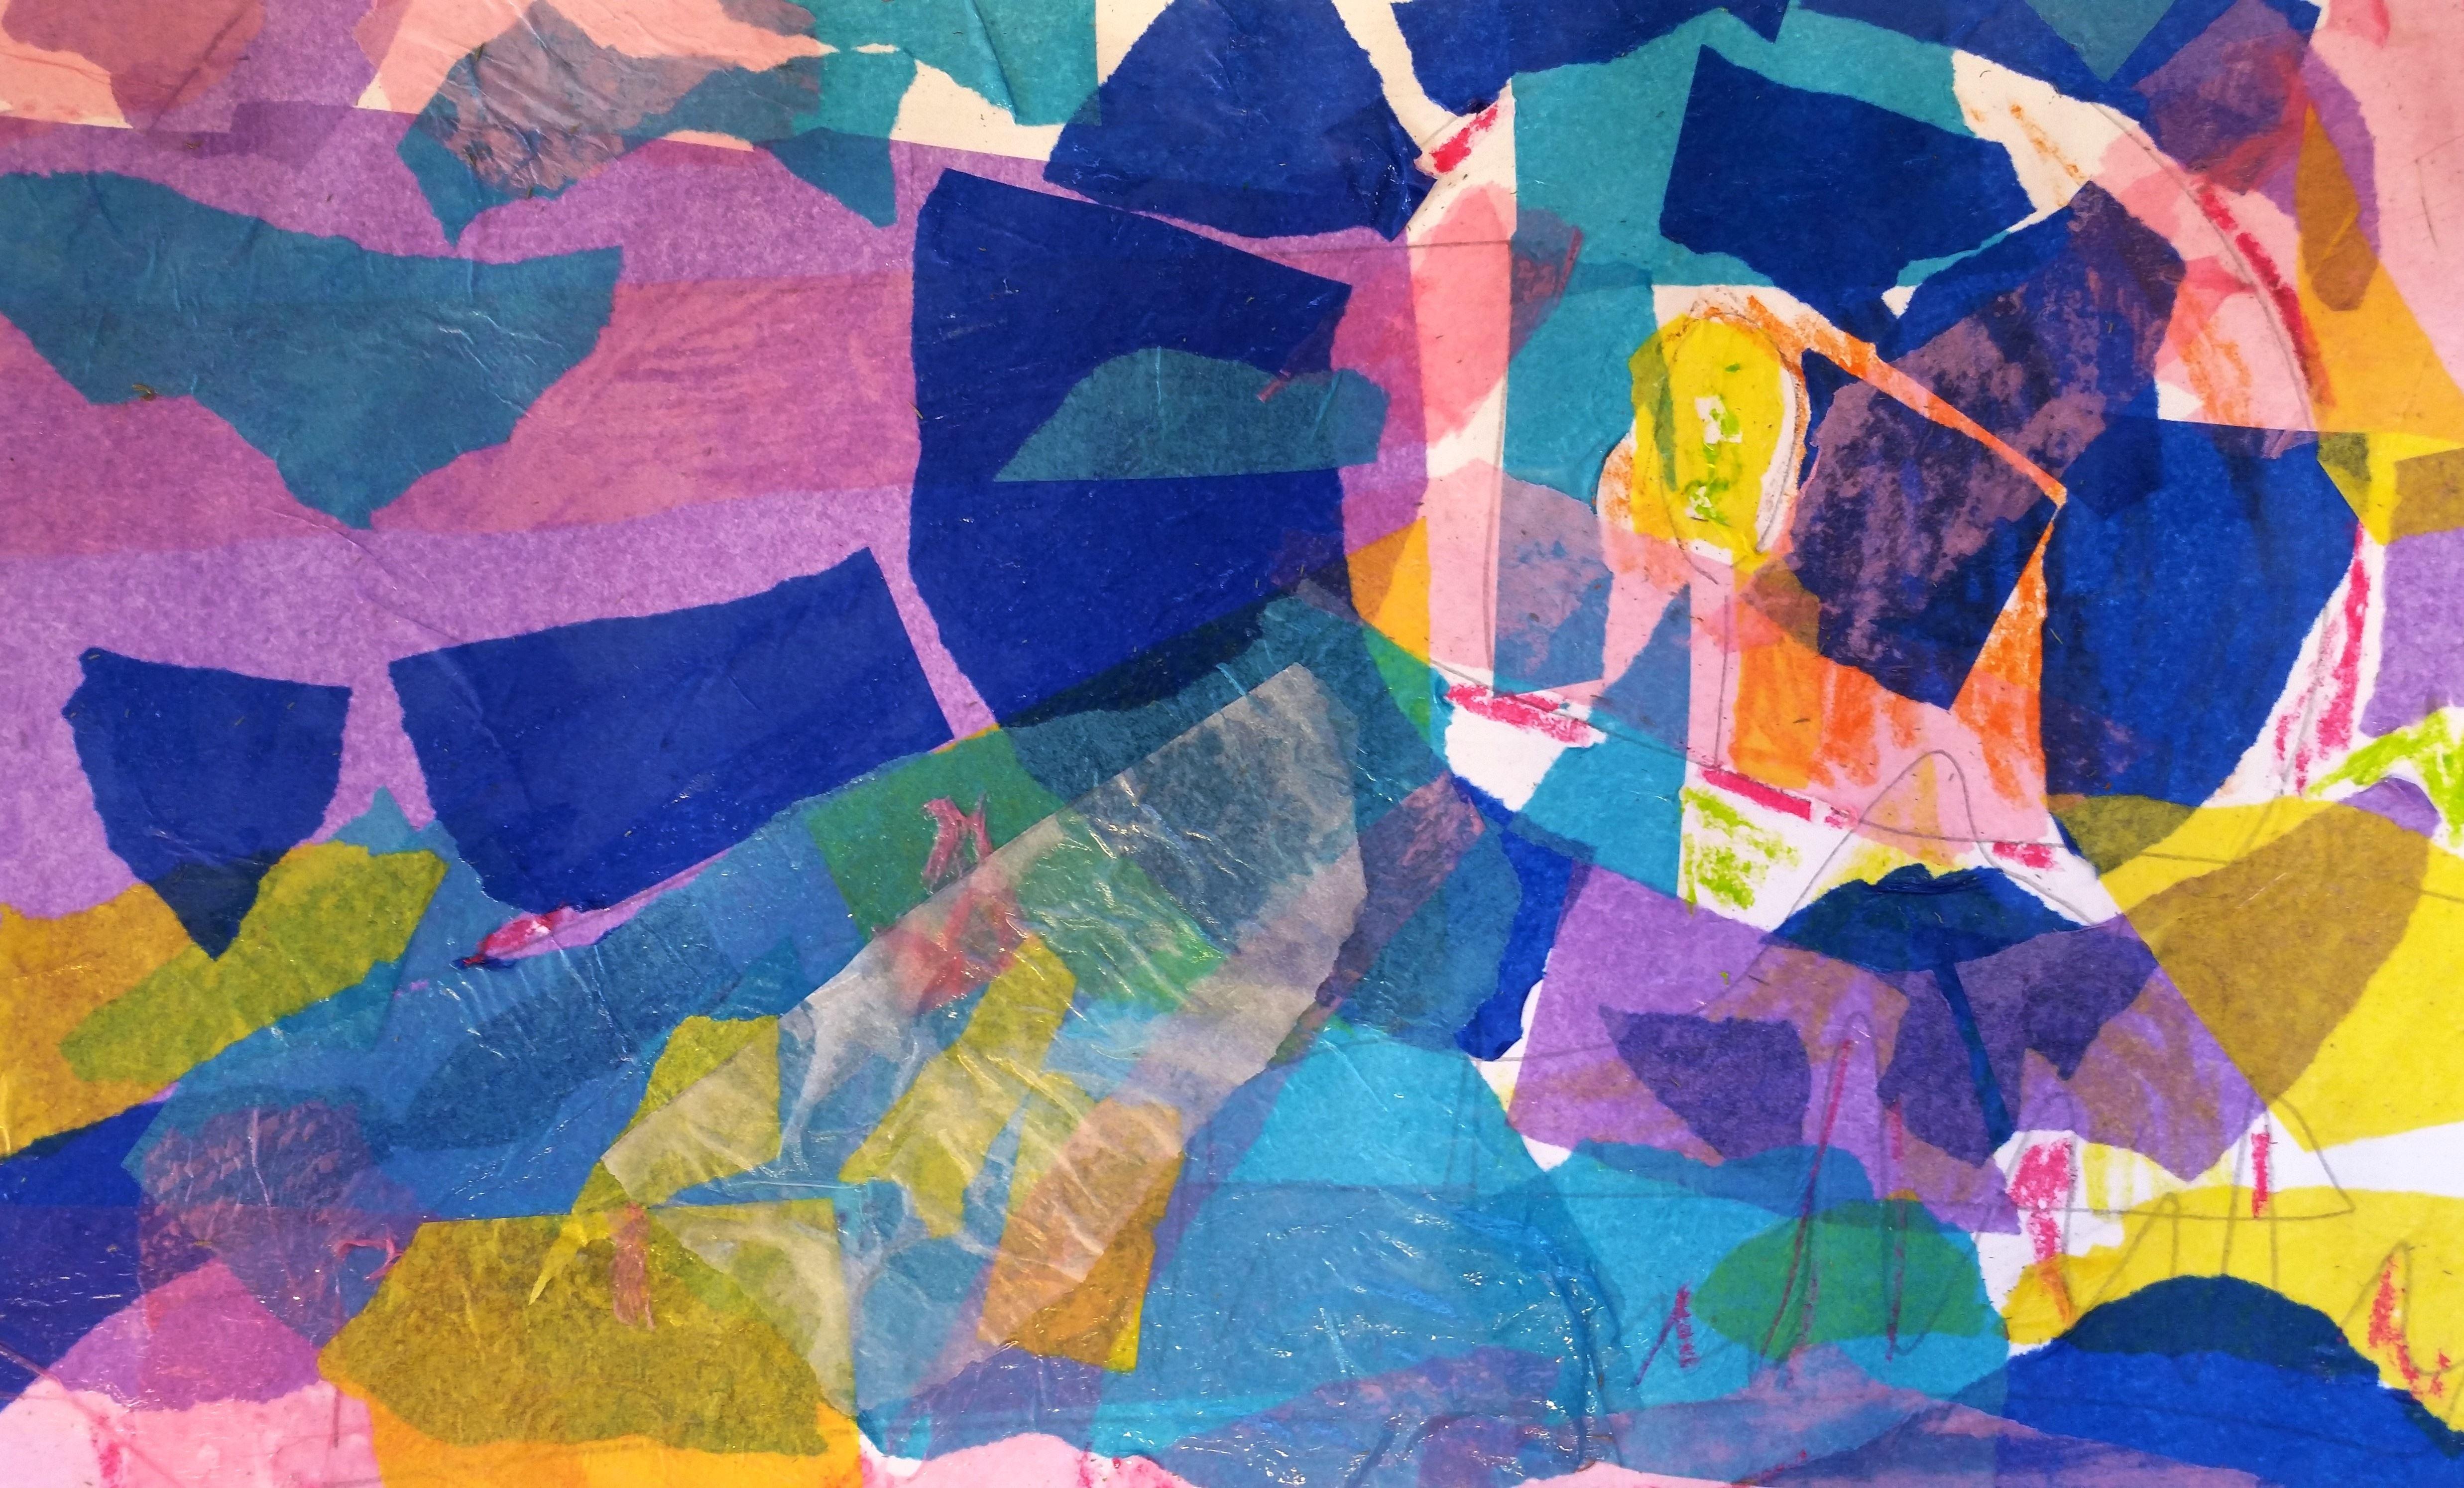 © Länsmuseet Gävleborg, Collage med silkespapper